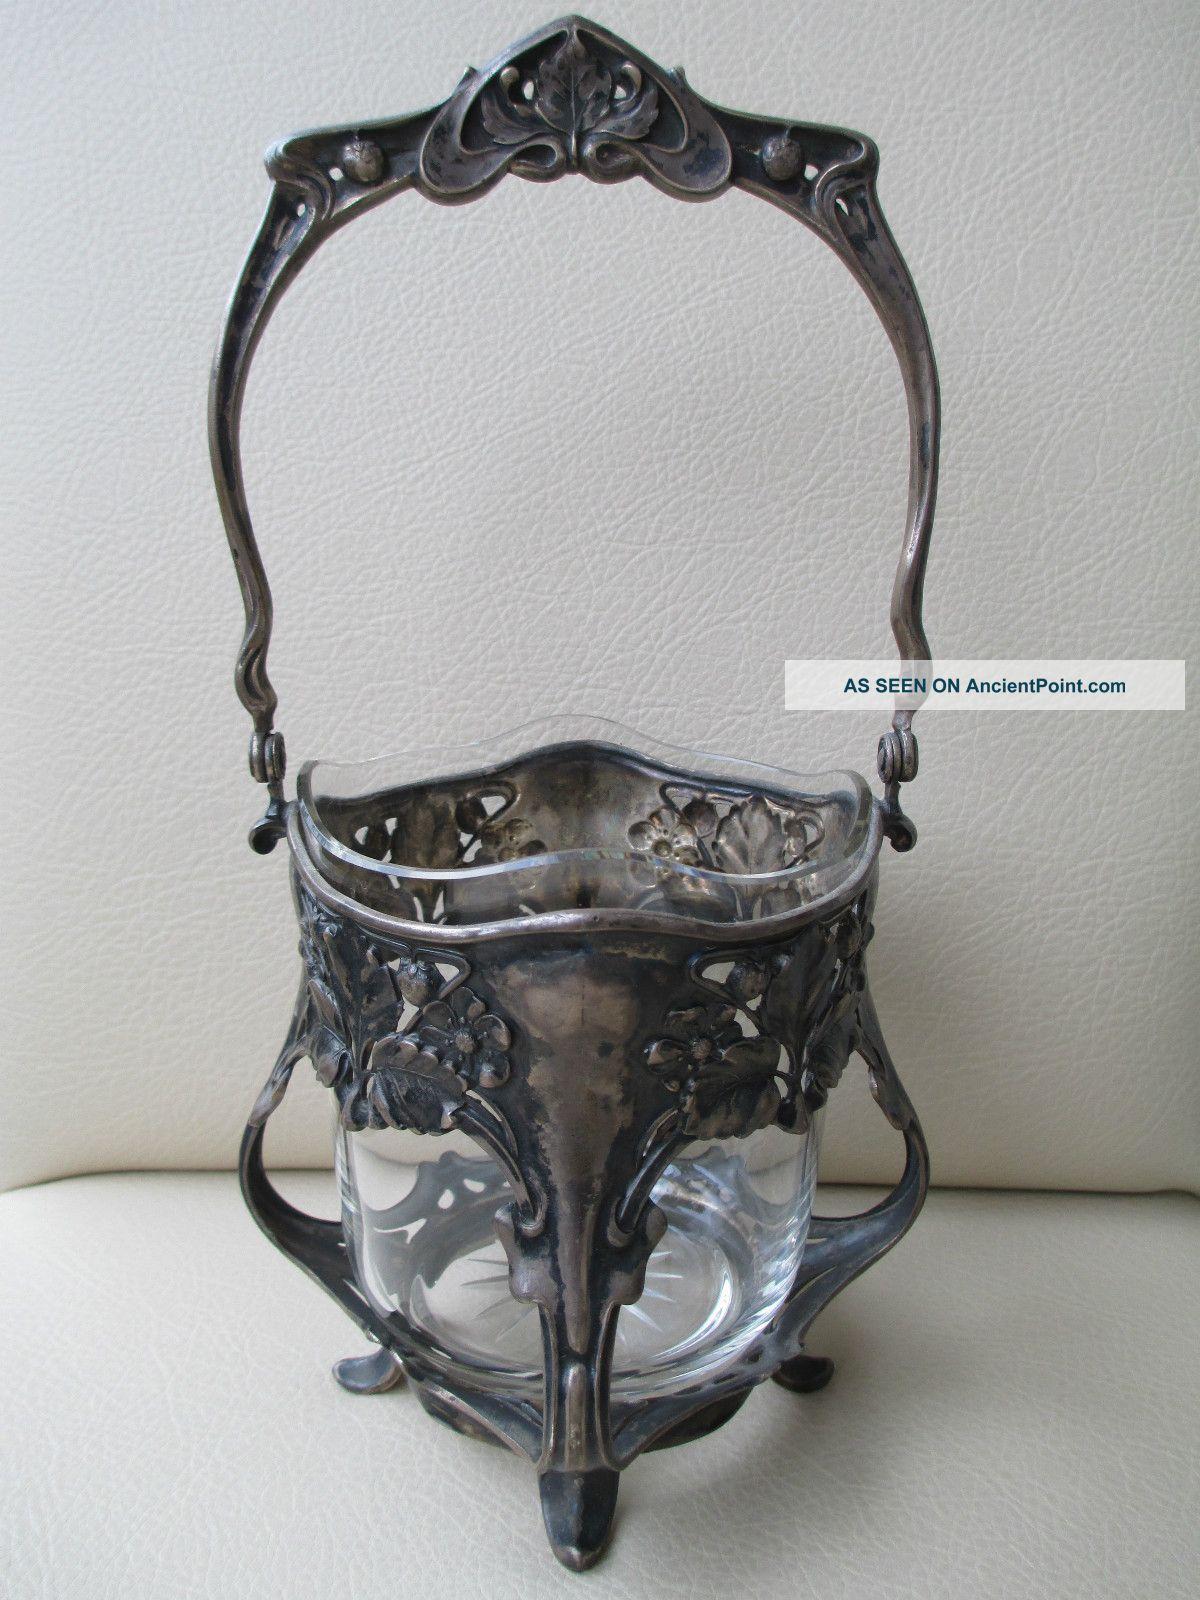 Stunning Antique Silver Art Nouveau Basket H.  S.  Goldschmidt&sohn Germany C.  1900 Germany photo